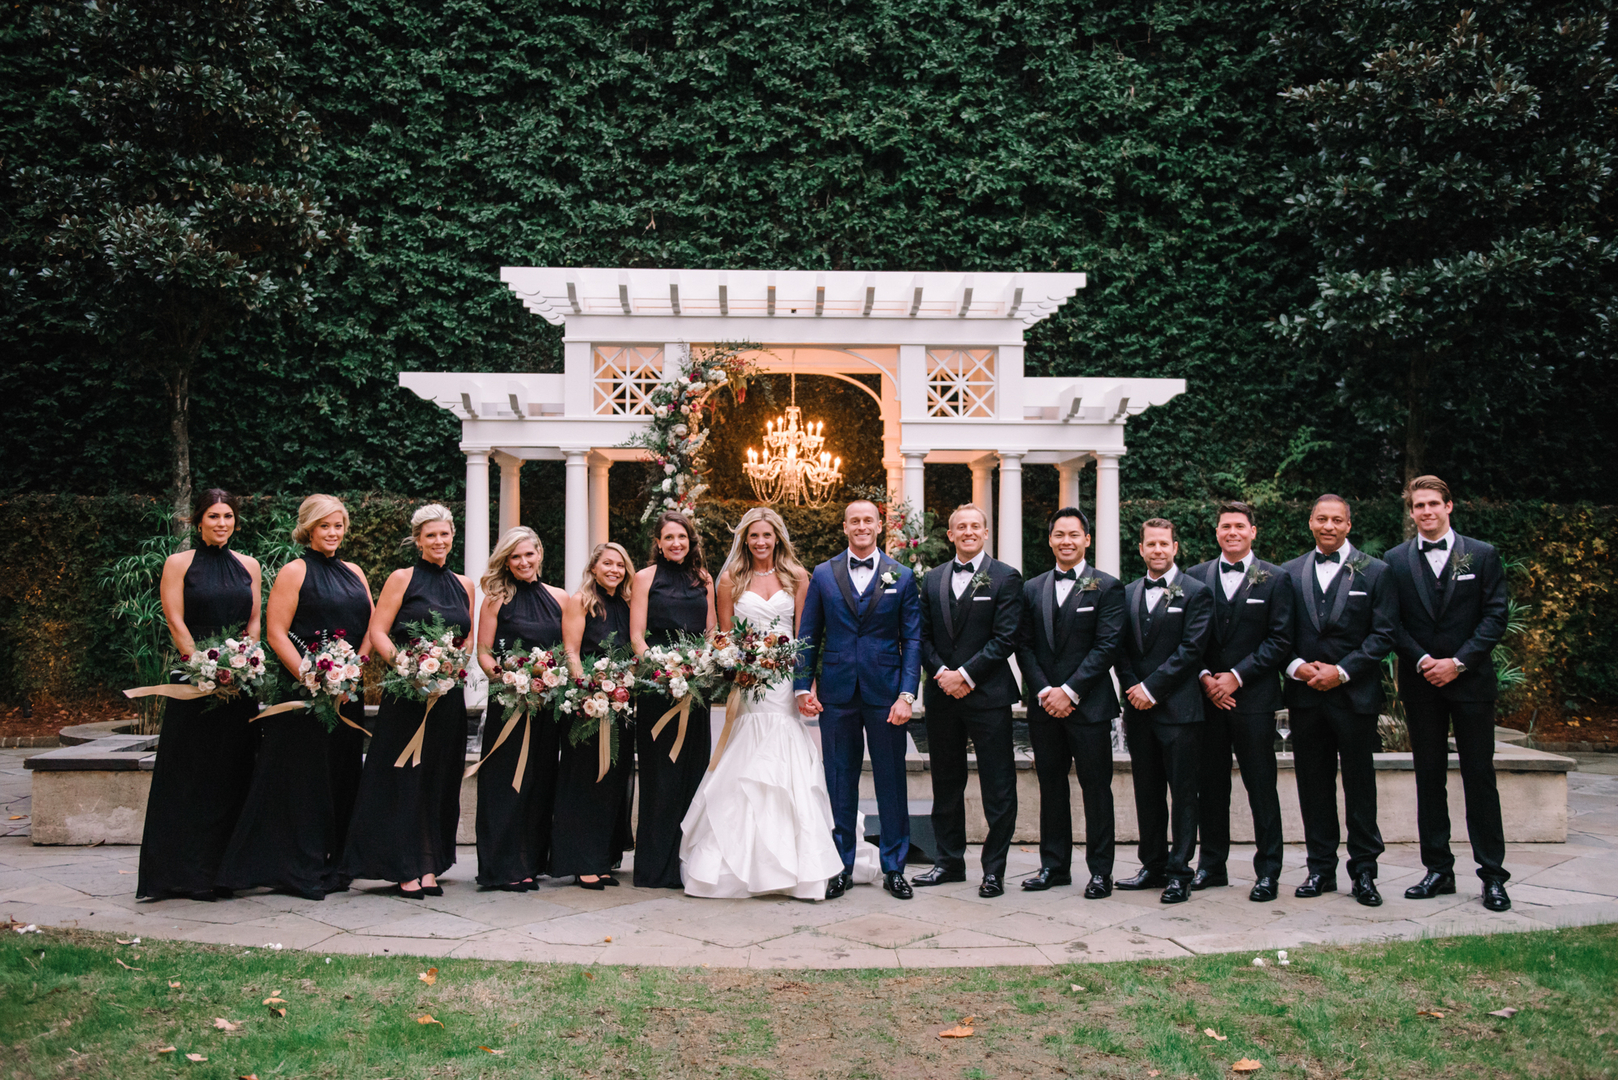 william-aiken-house-wedding-38.jpg